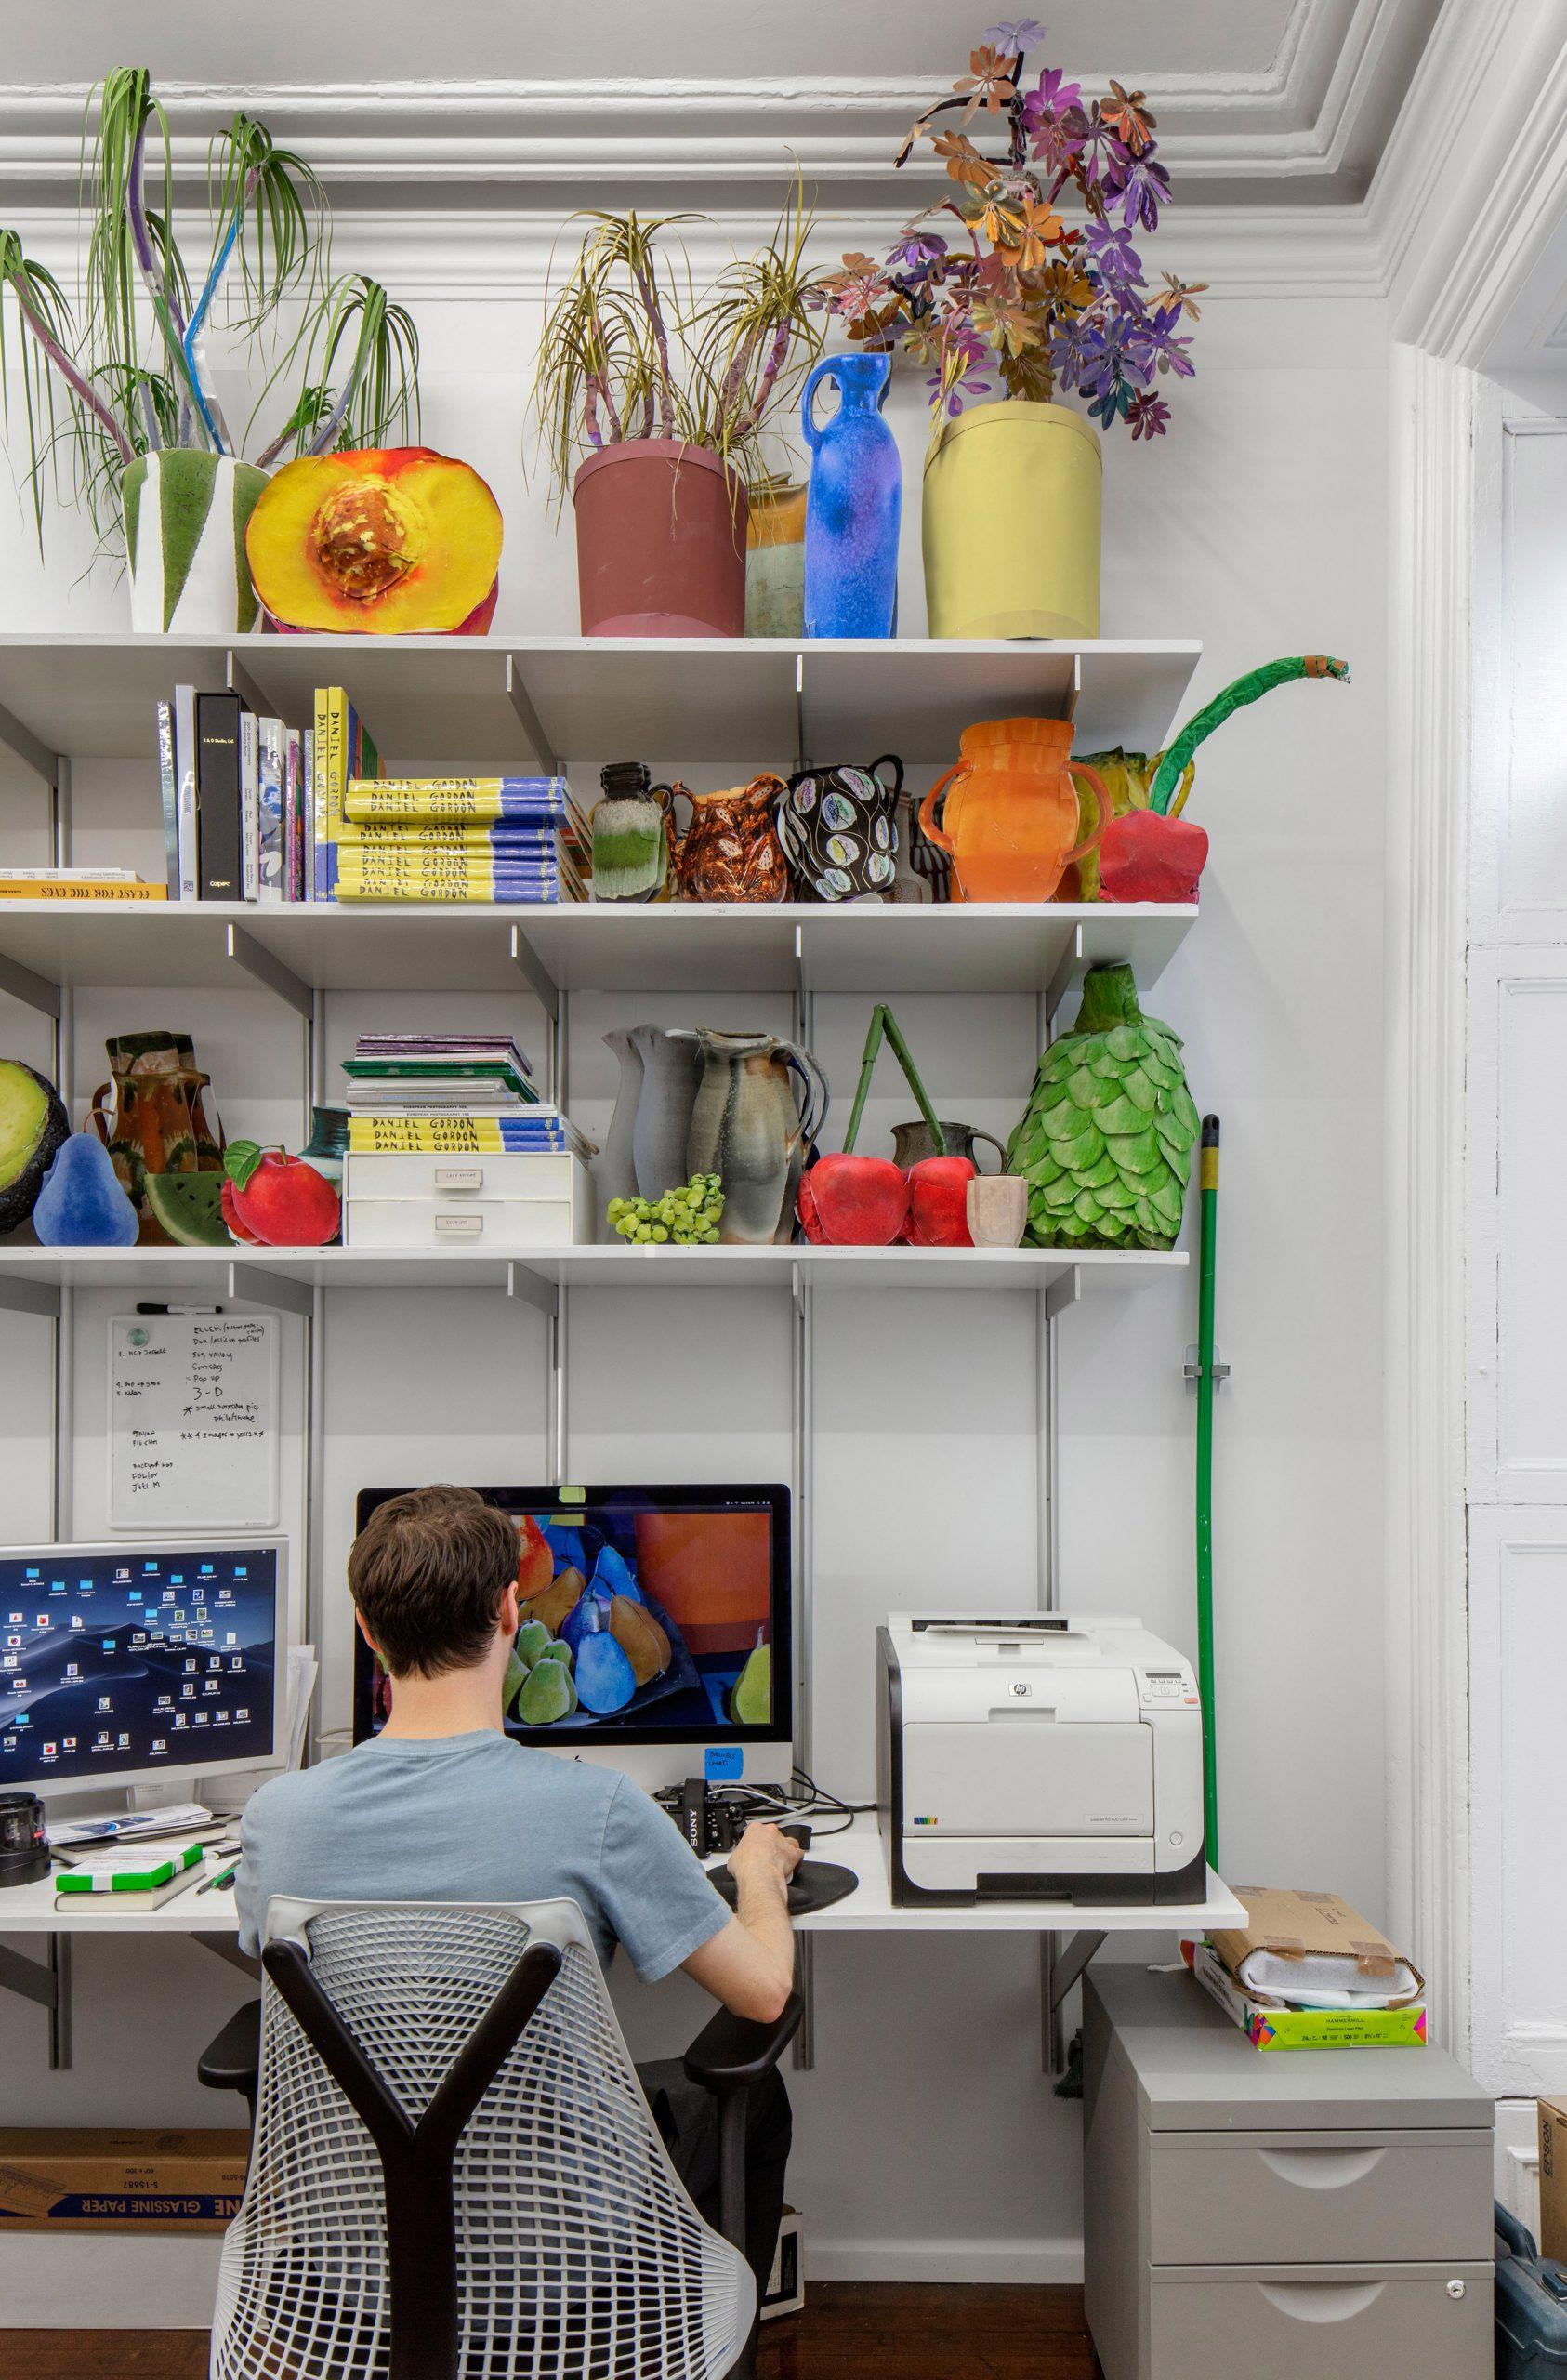 Daniel Gordon's photo studio